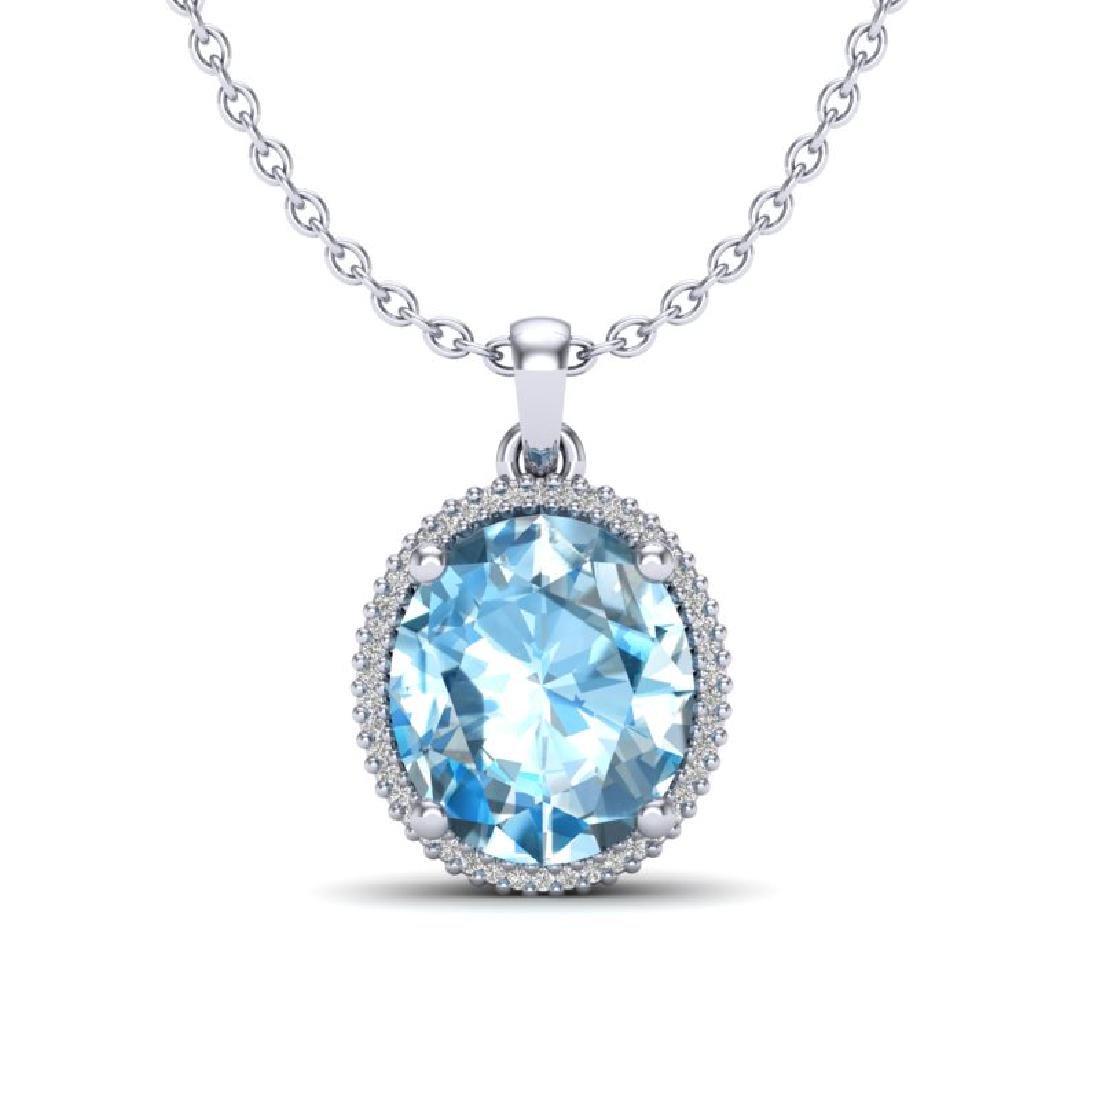 12 CTW Sky Blue Topaz & Micro VS/SI Diamond Halo